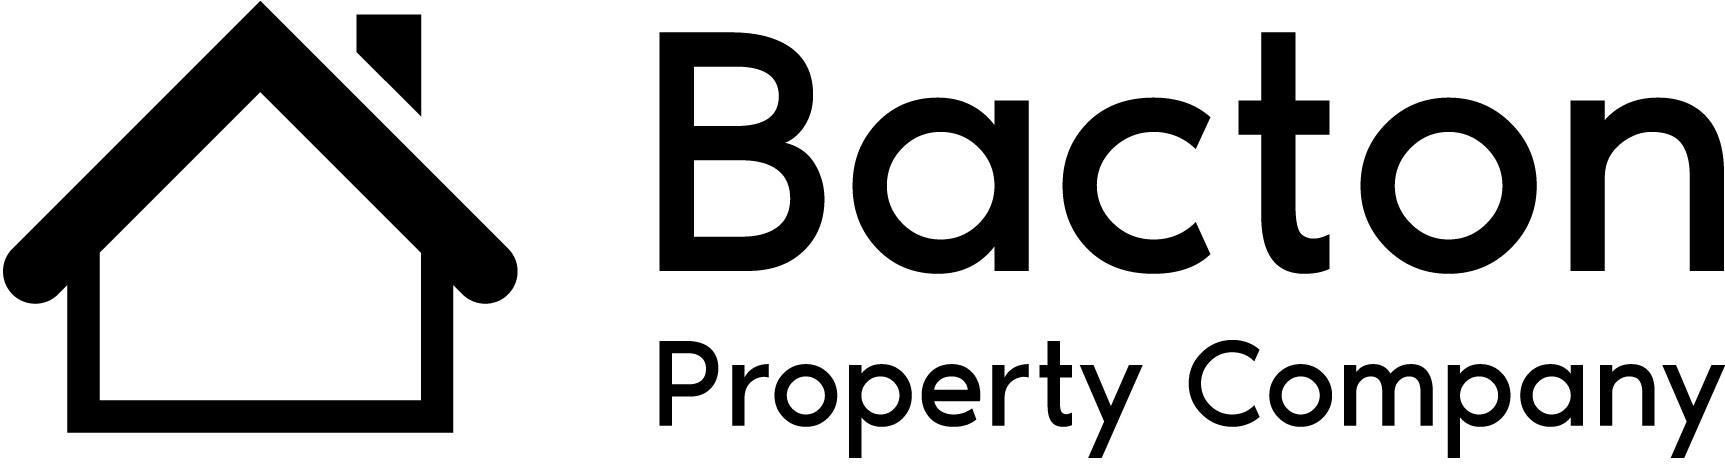 Bacton Property Company